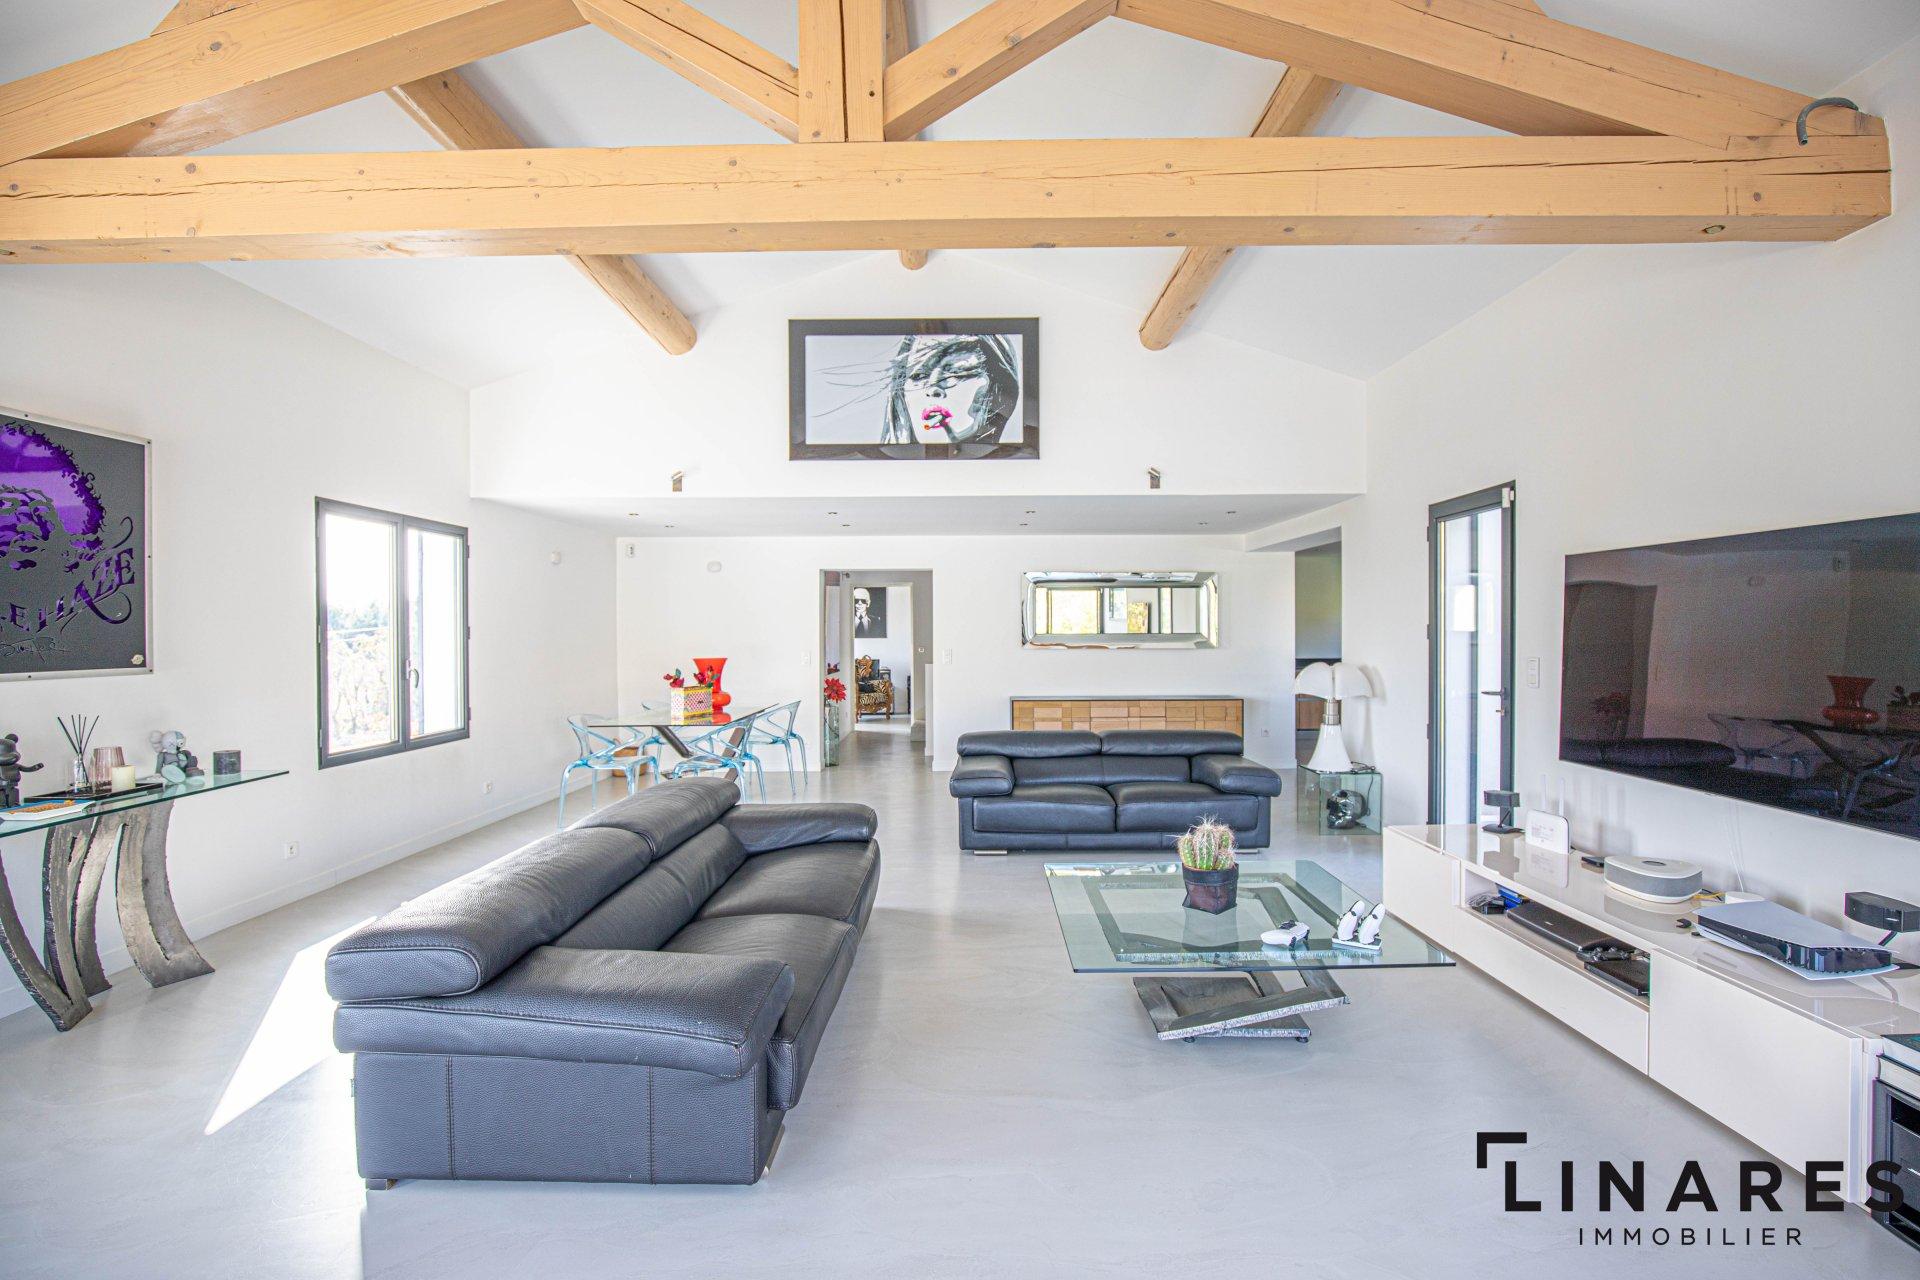 LA SIGNATURE - Villa de 240m2 habitable, terrain 2000m2 avec piscine et garage